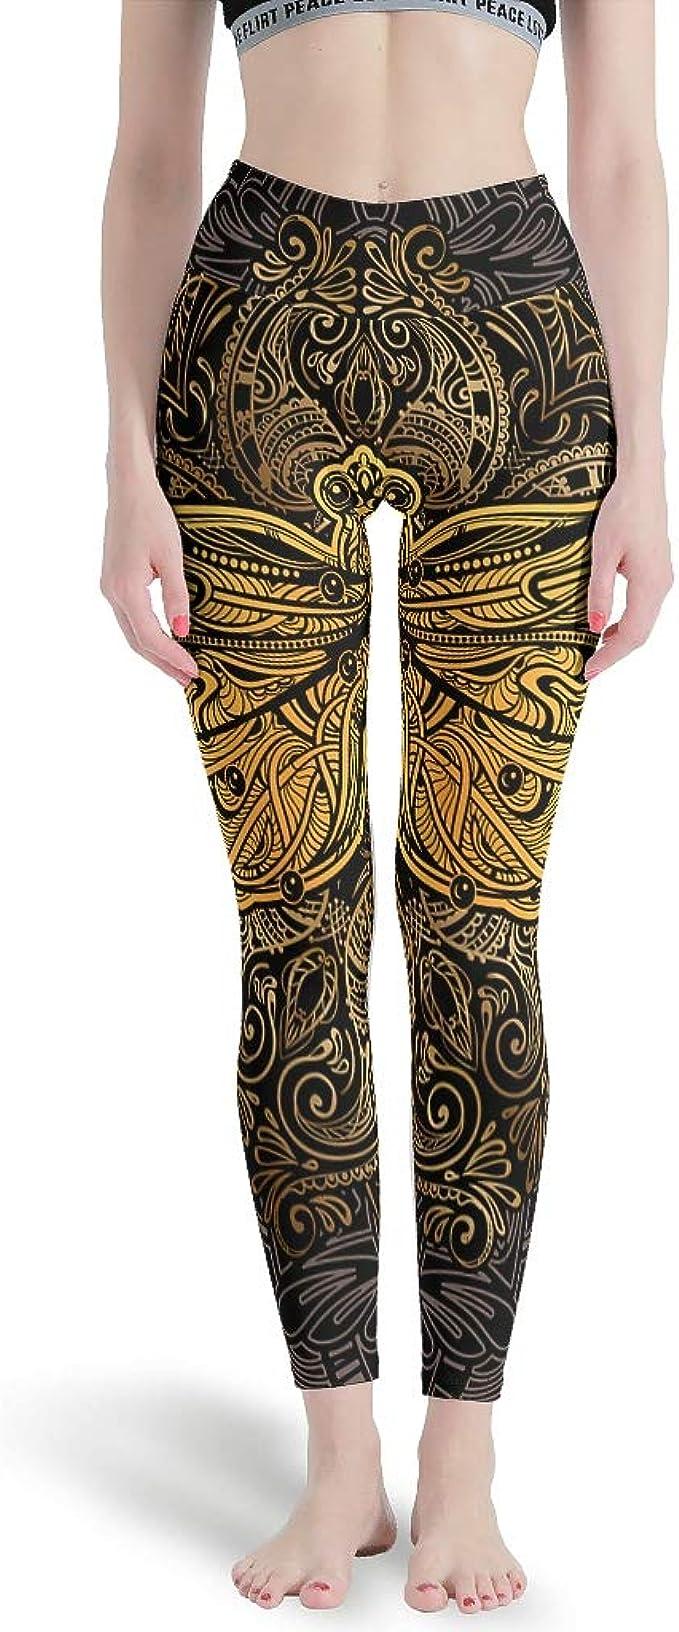 L S M Size XS Dragonfly Print High Waist Yoga Leggings XL